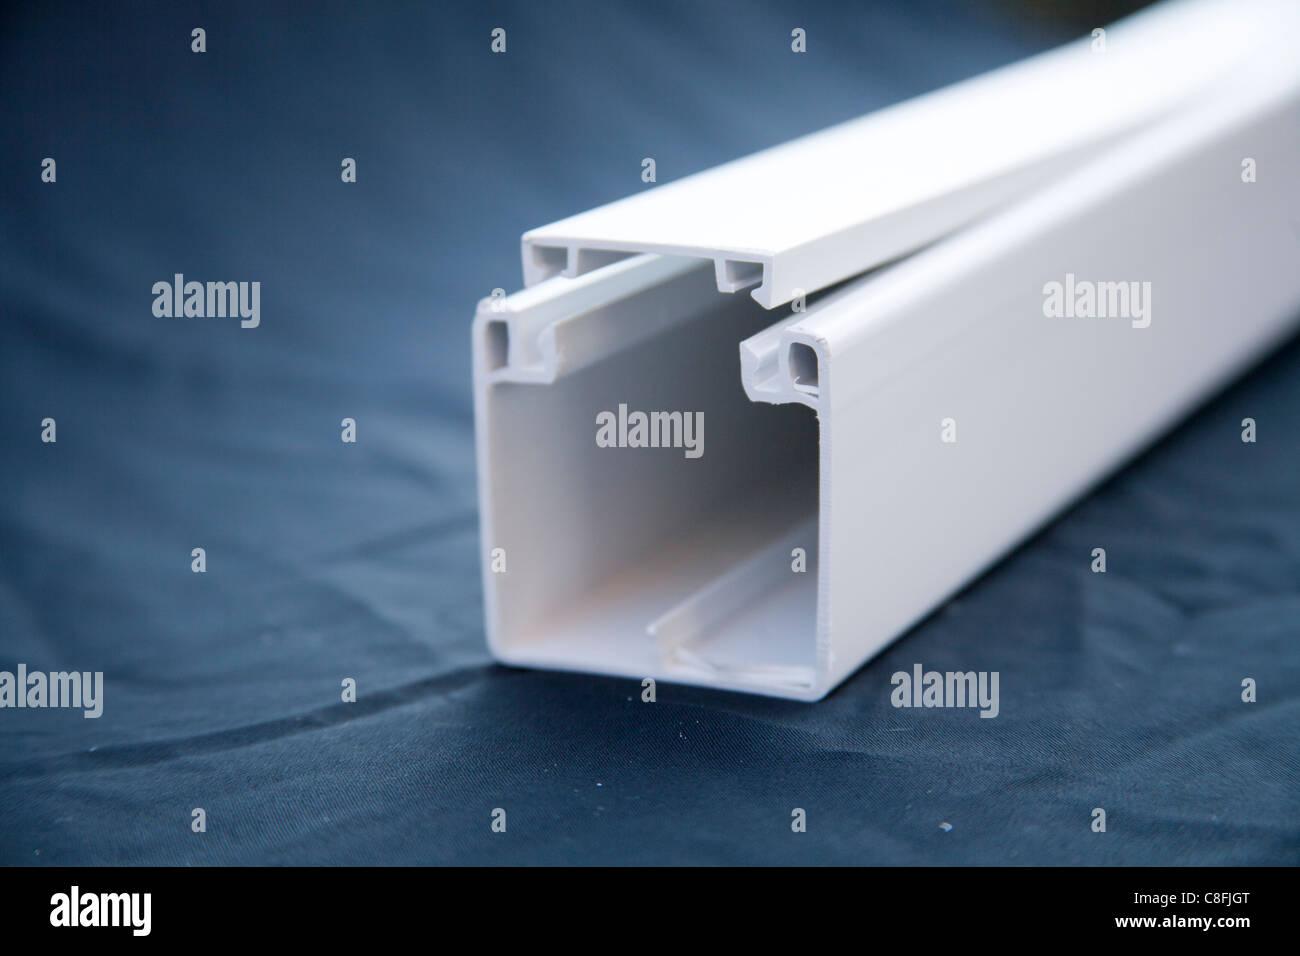 Kunststoff Kabelkanal 50 x 50 mm Stockfoto, Bild: 39681848 - Alamy